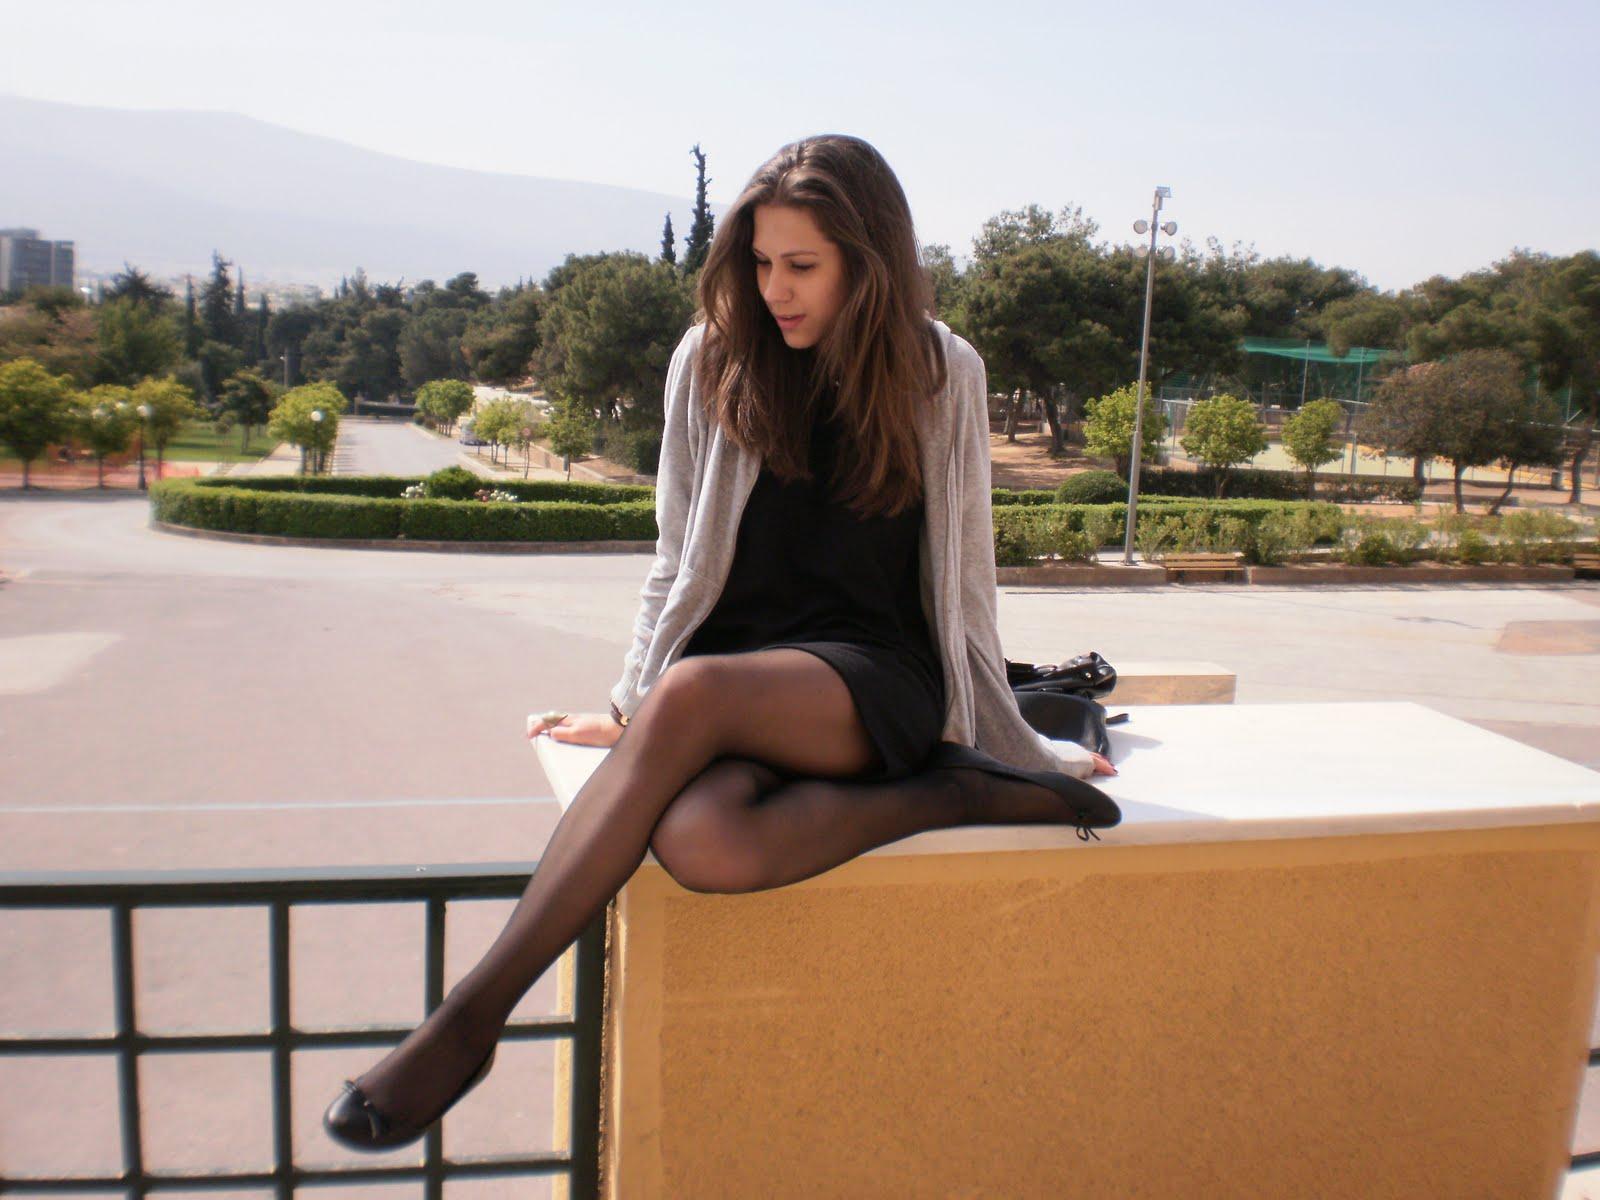 Yuka Hayami Marchen Story | Download Free Nude Porn Picture